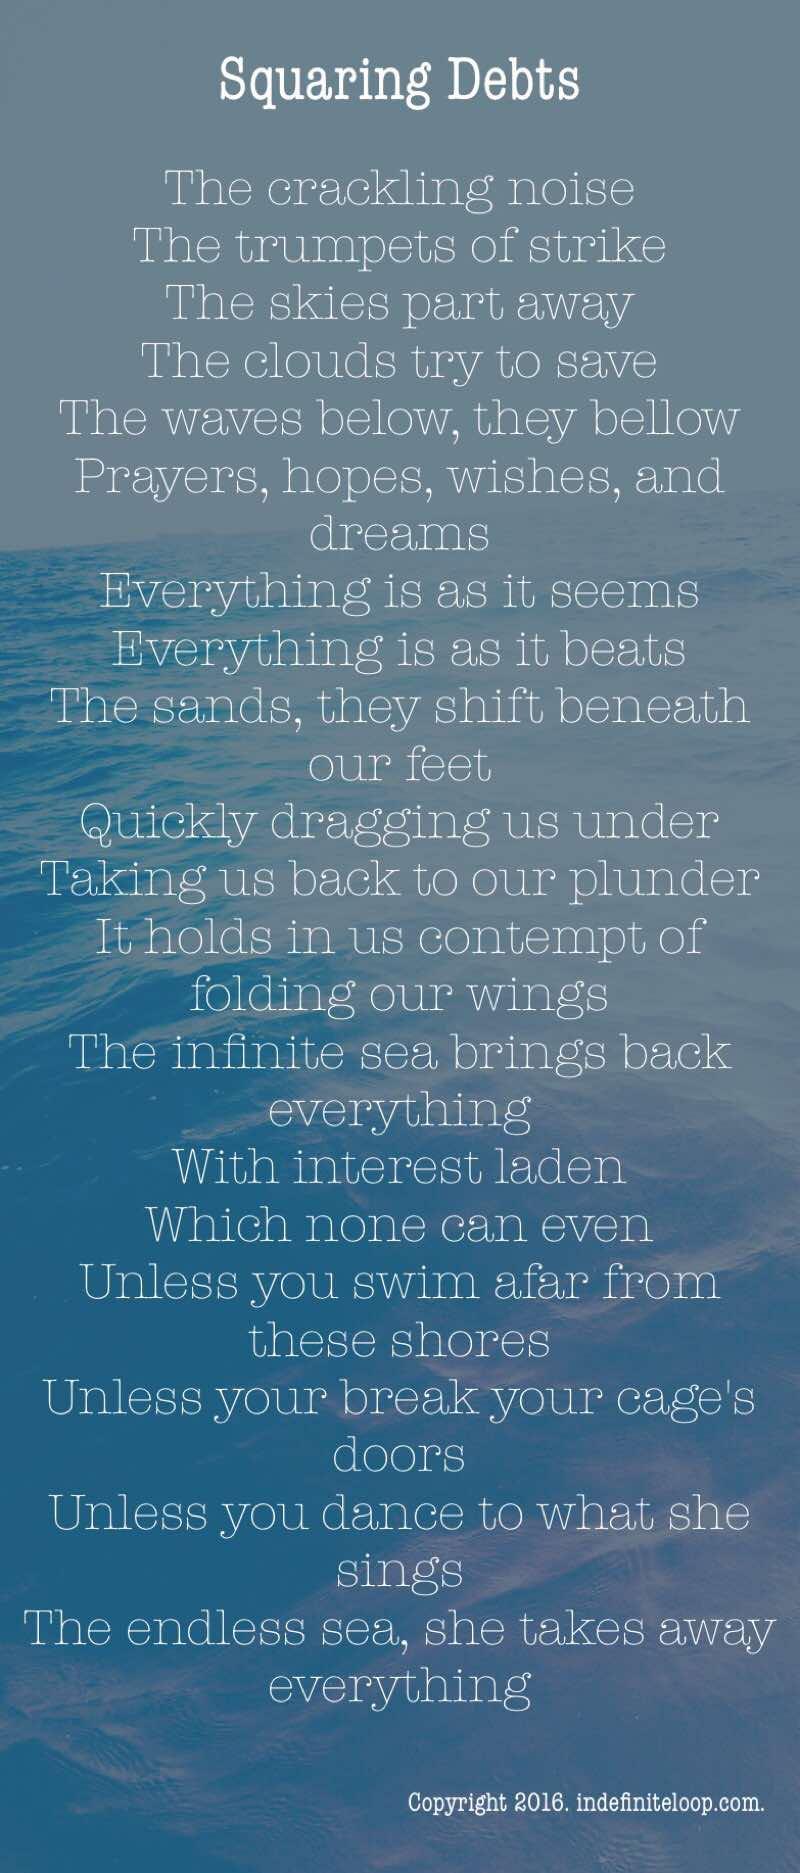 Squaring Debts - Poem - Copyright indefiniteloop.com